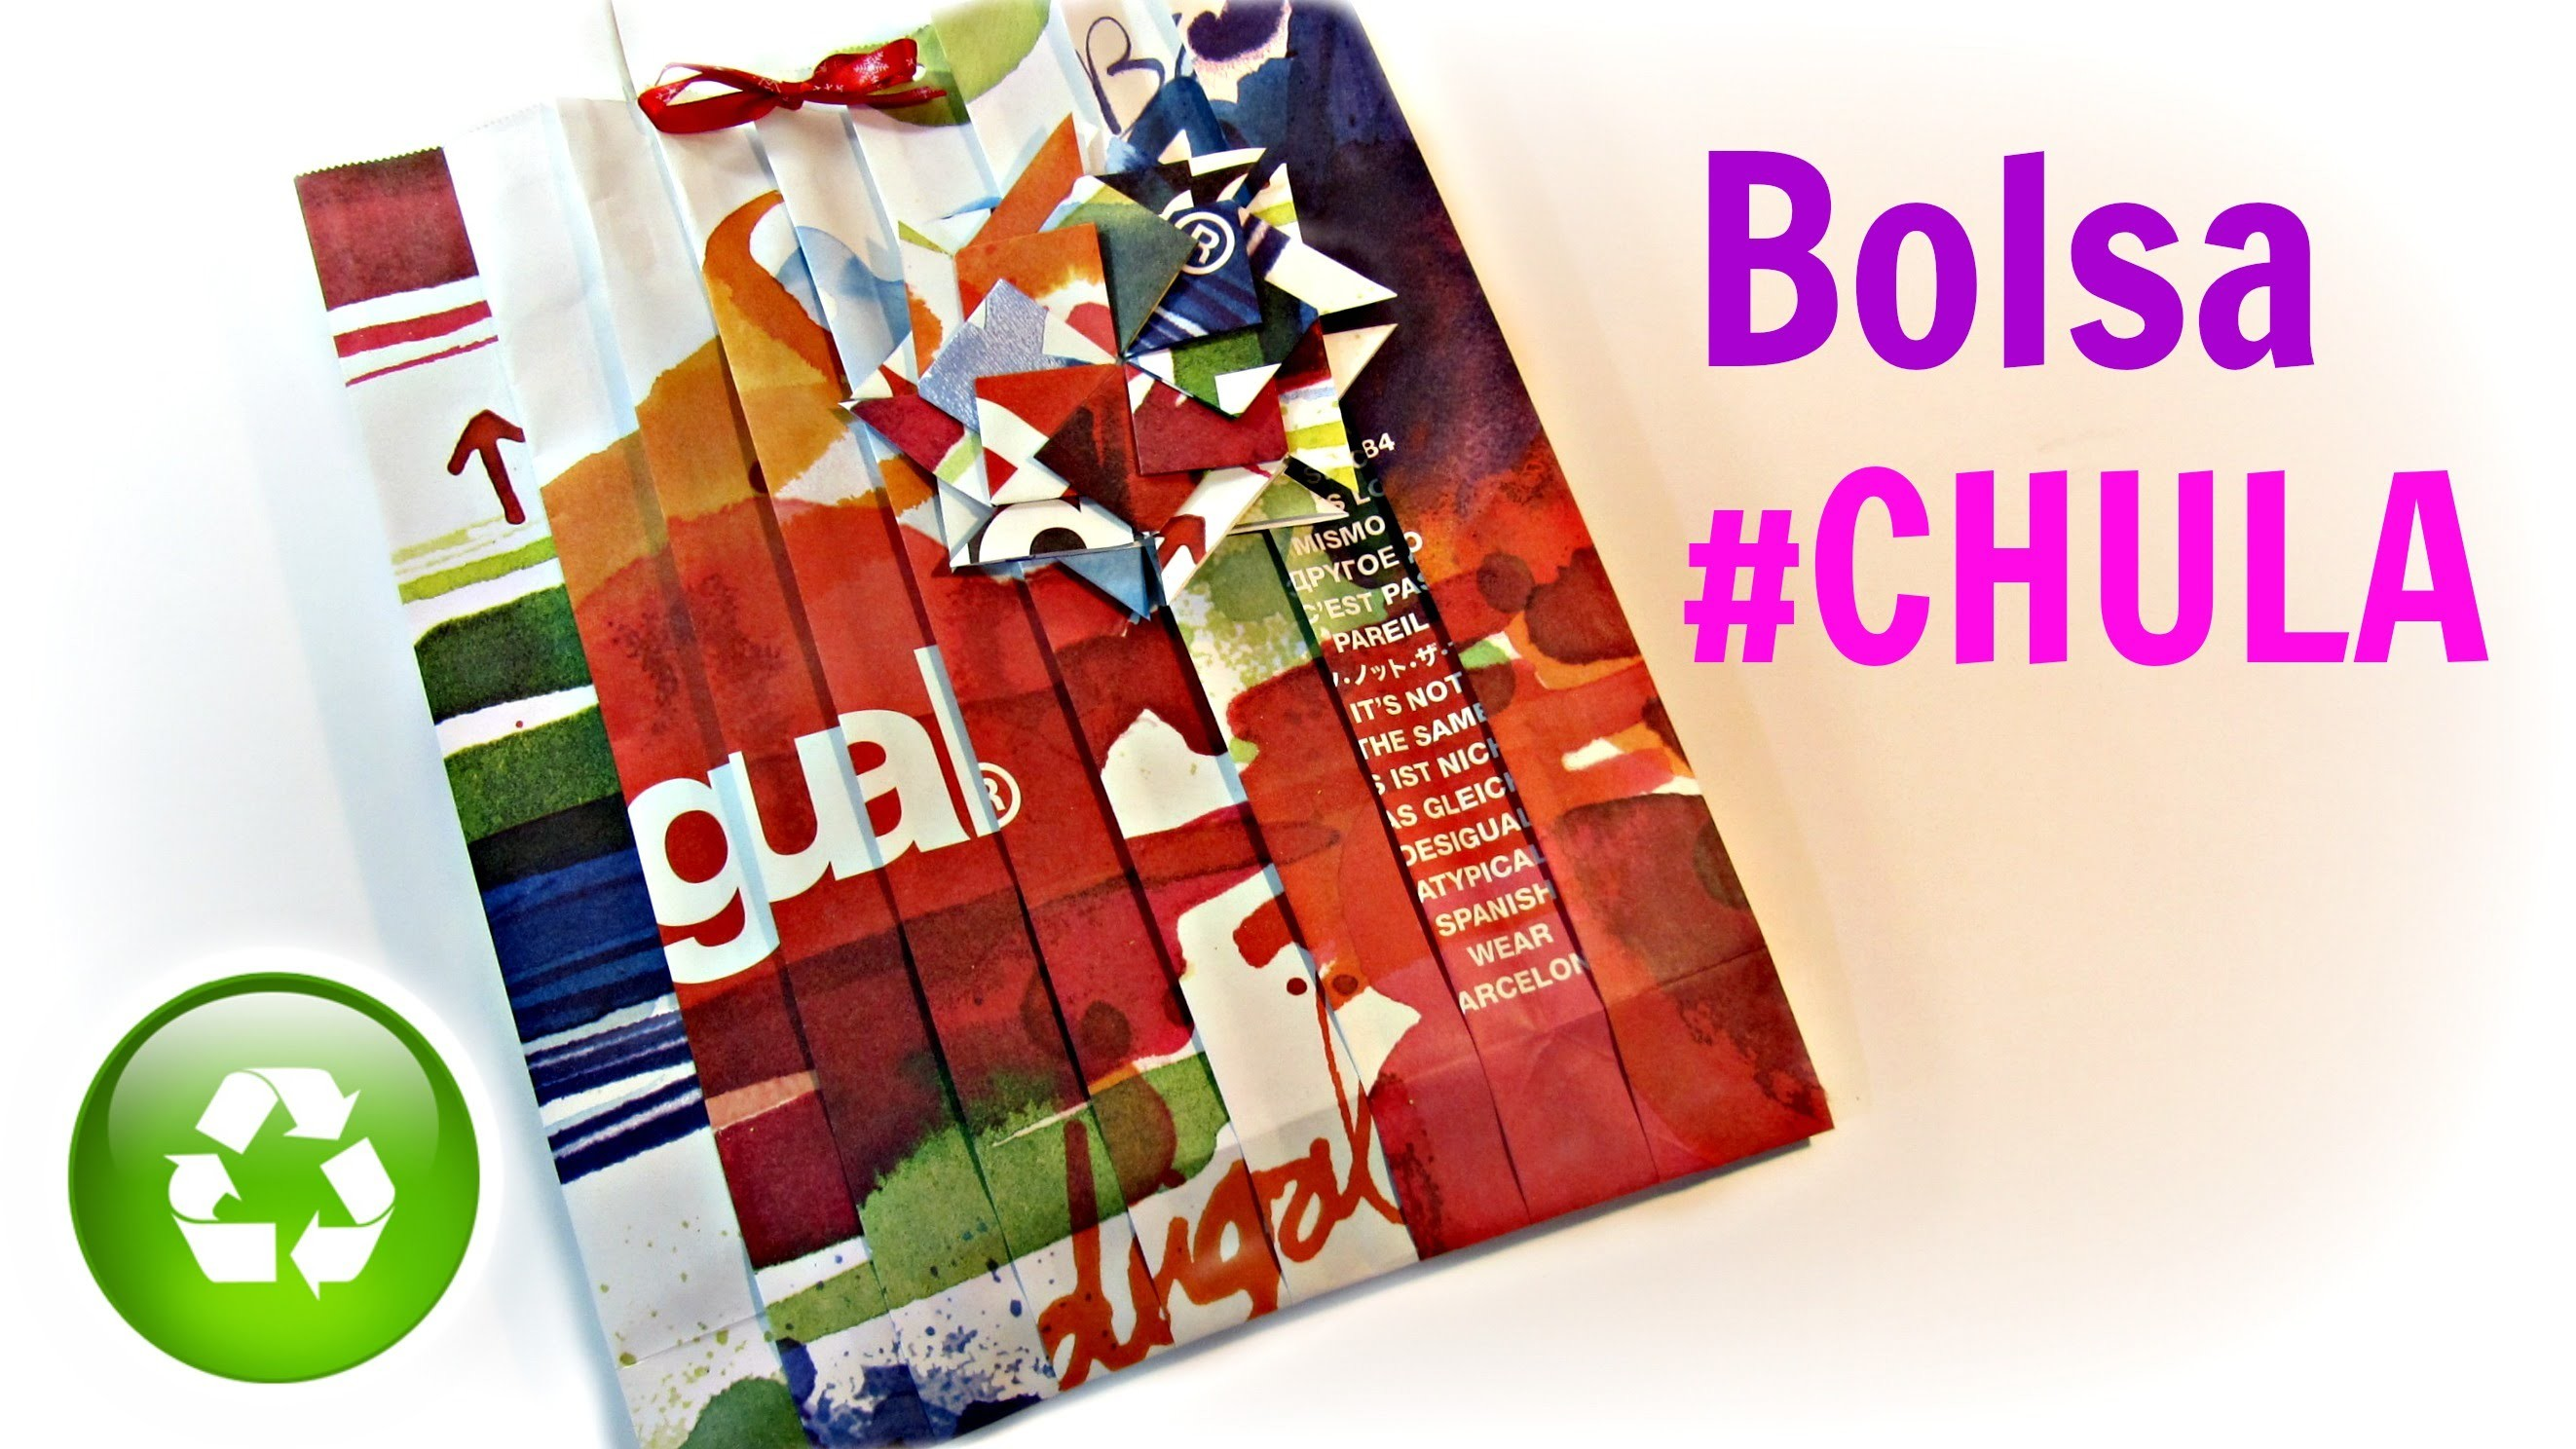 Bolsa #chula. Chula bag.